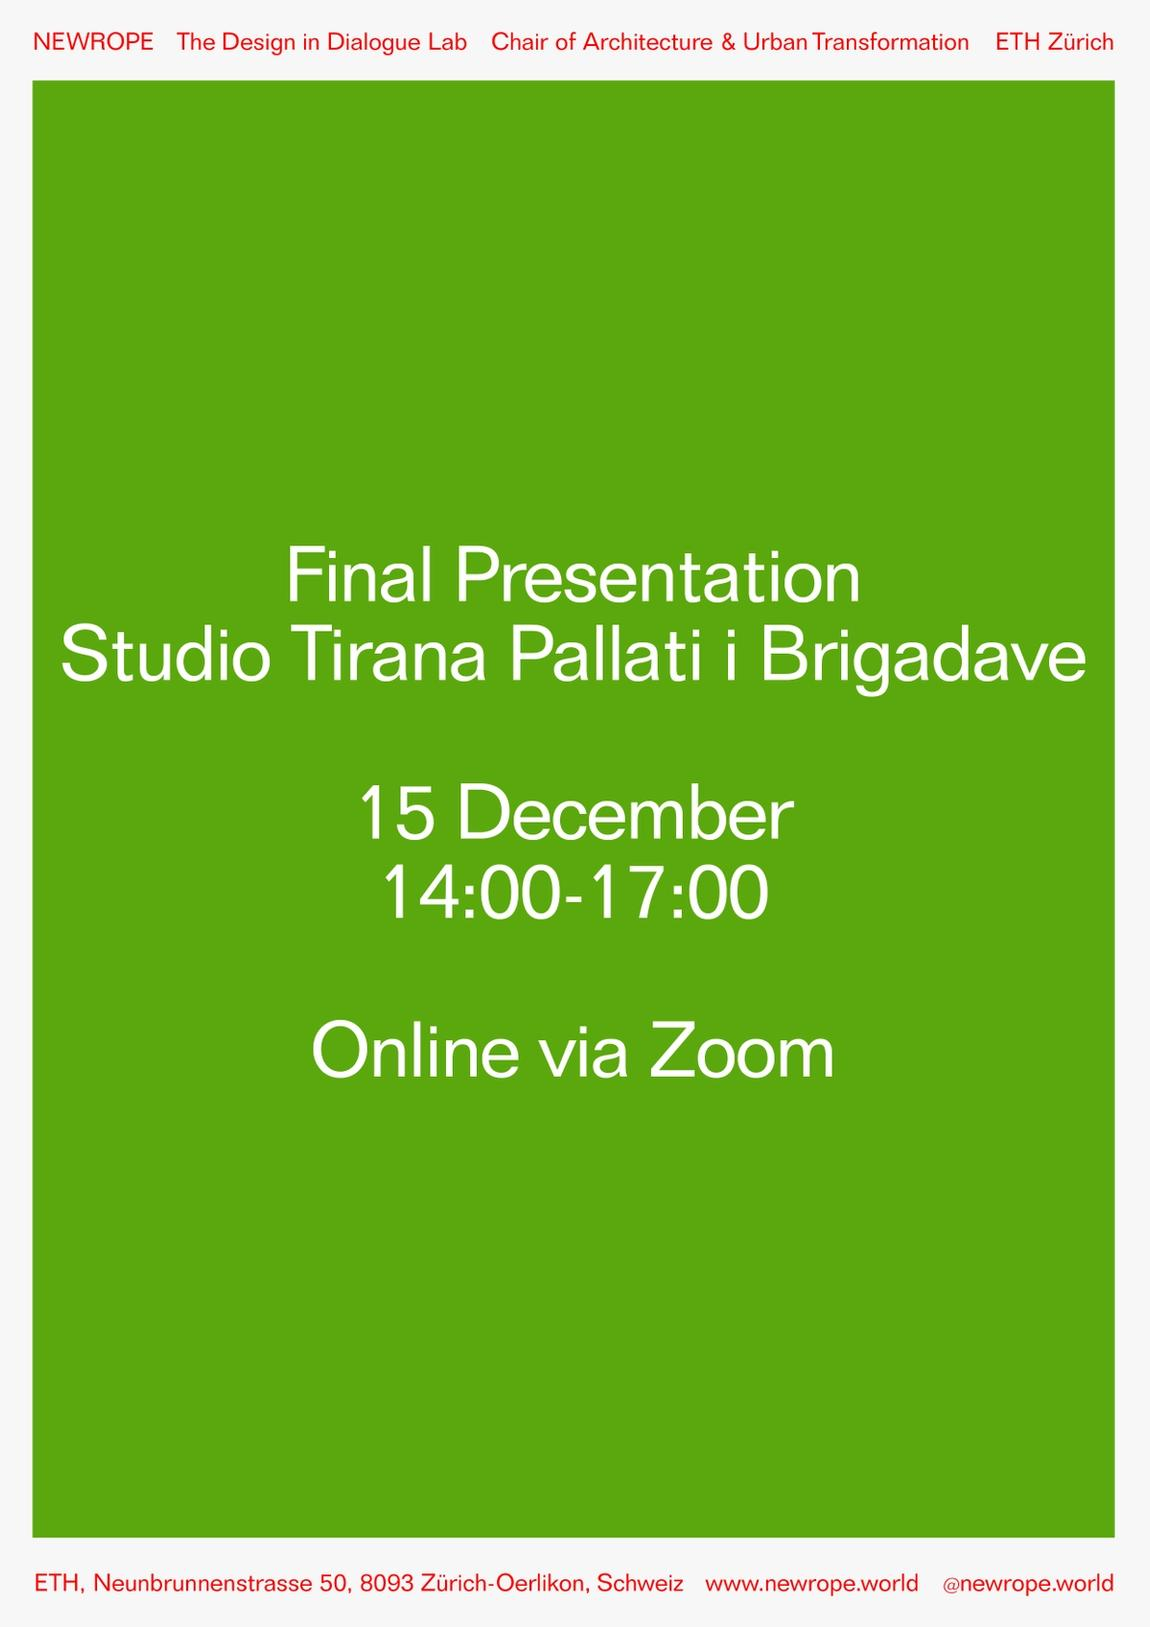 Poster final presentation Studio Tirana